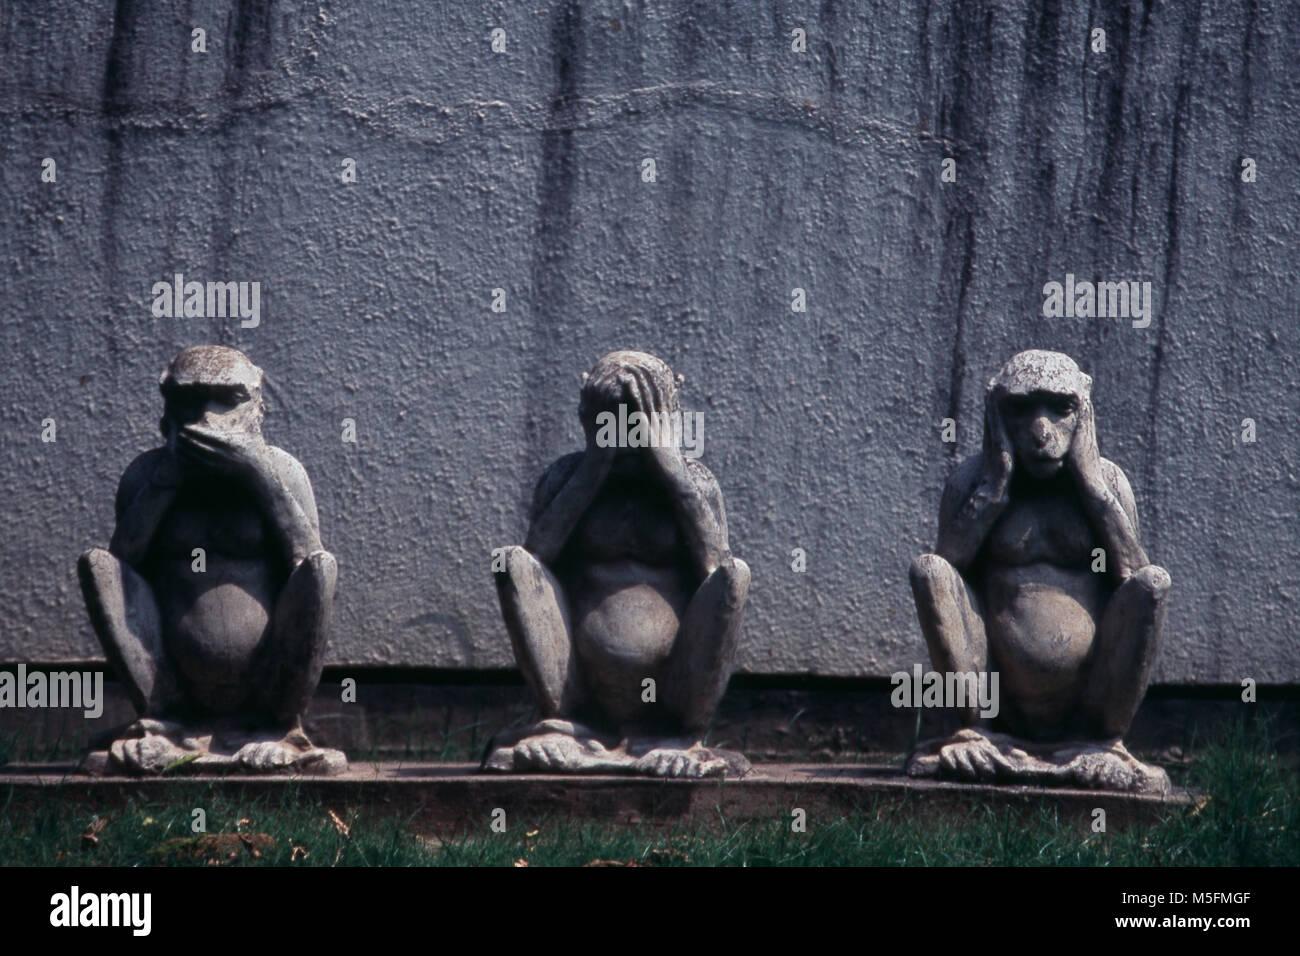 Three Wise Monkeys in Sabarmati Ashram, Ahmedabad, Gujarat, India - Stock Image